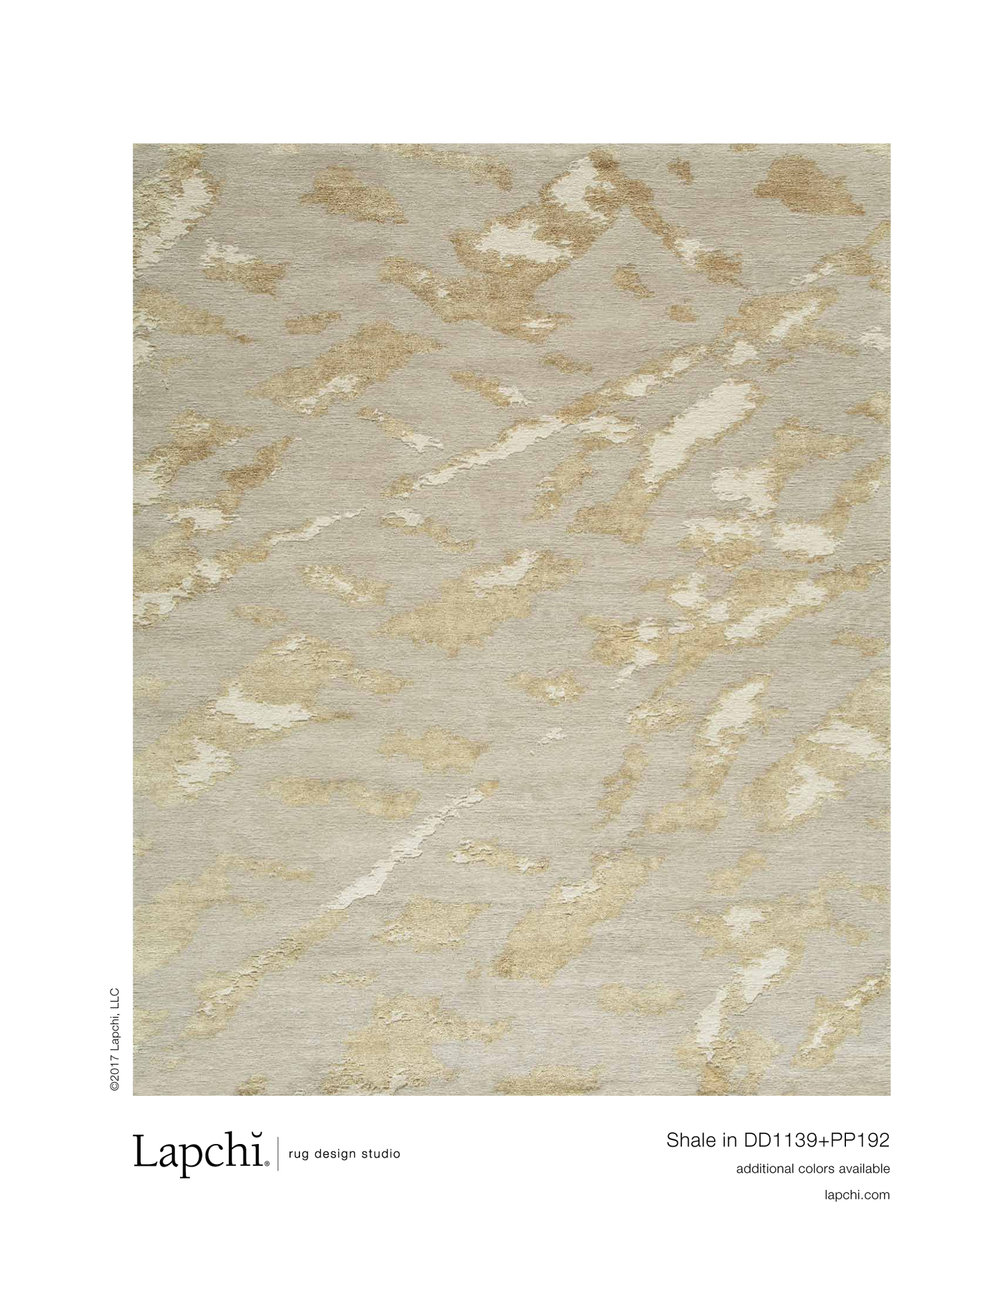 Shale area rug from Lapchi rug design studio.